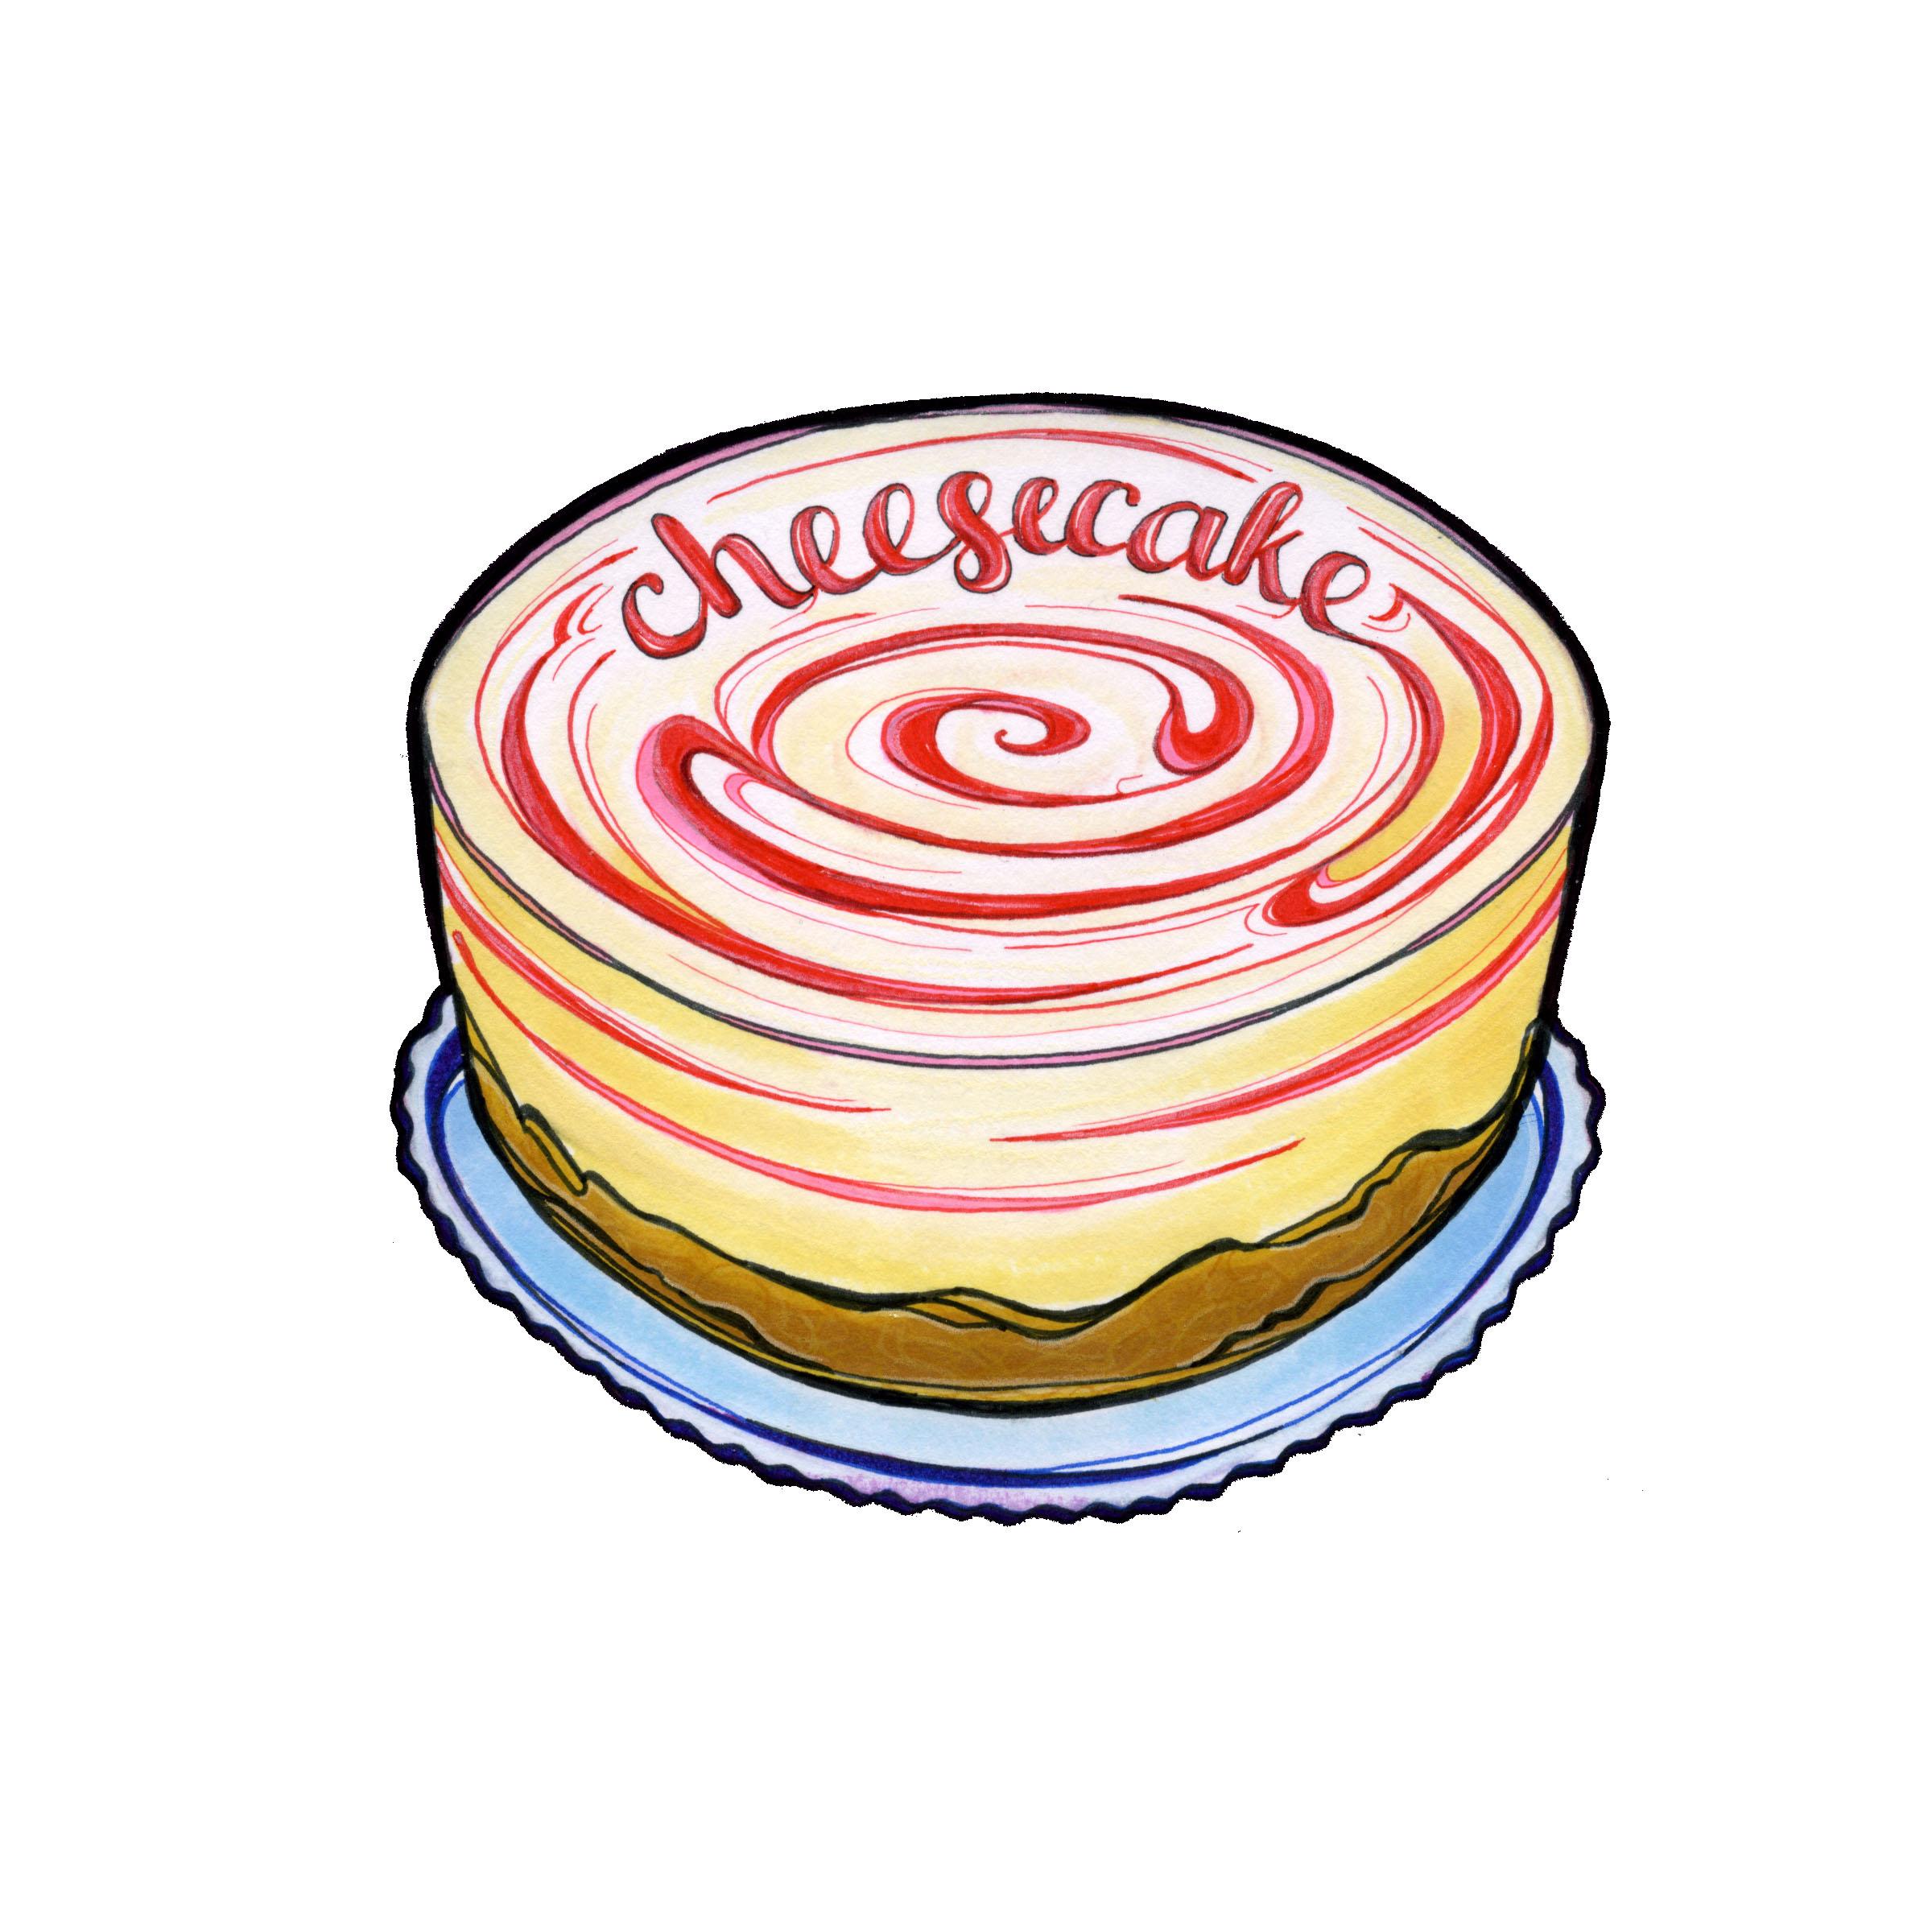 Cheesecake white copy.jpg